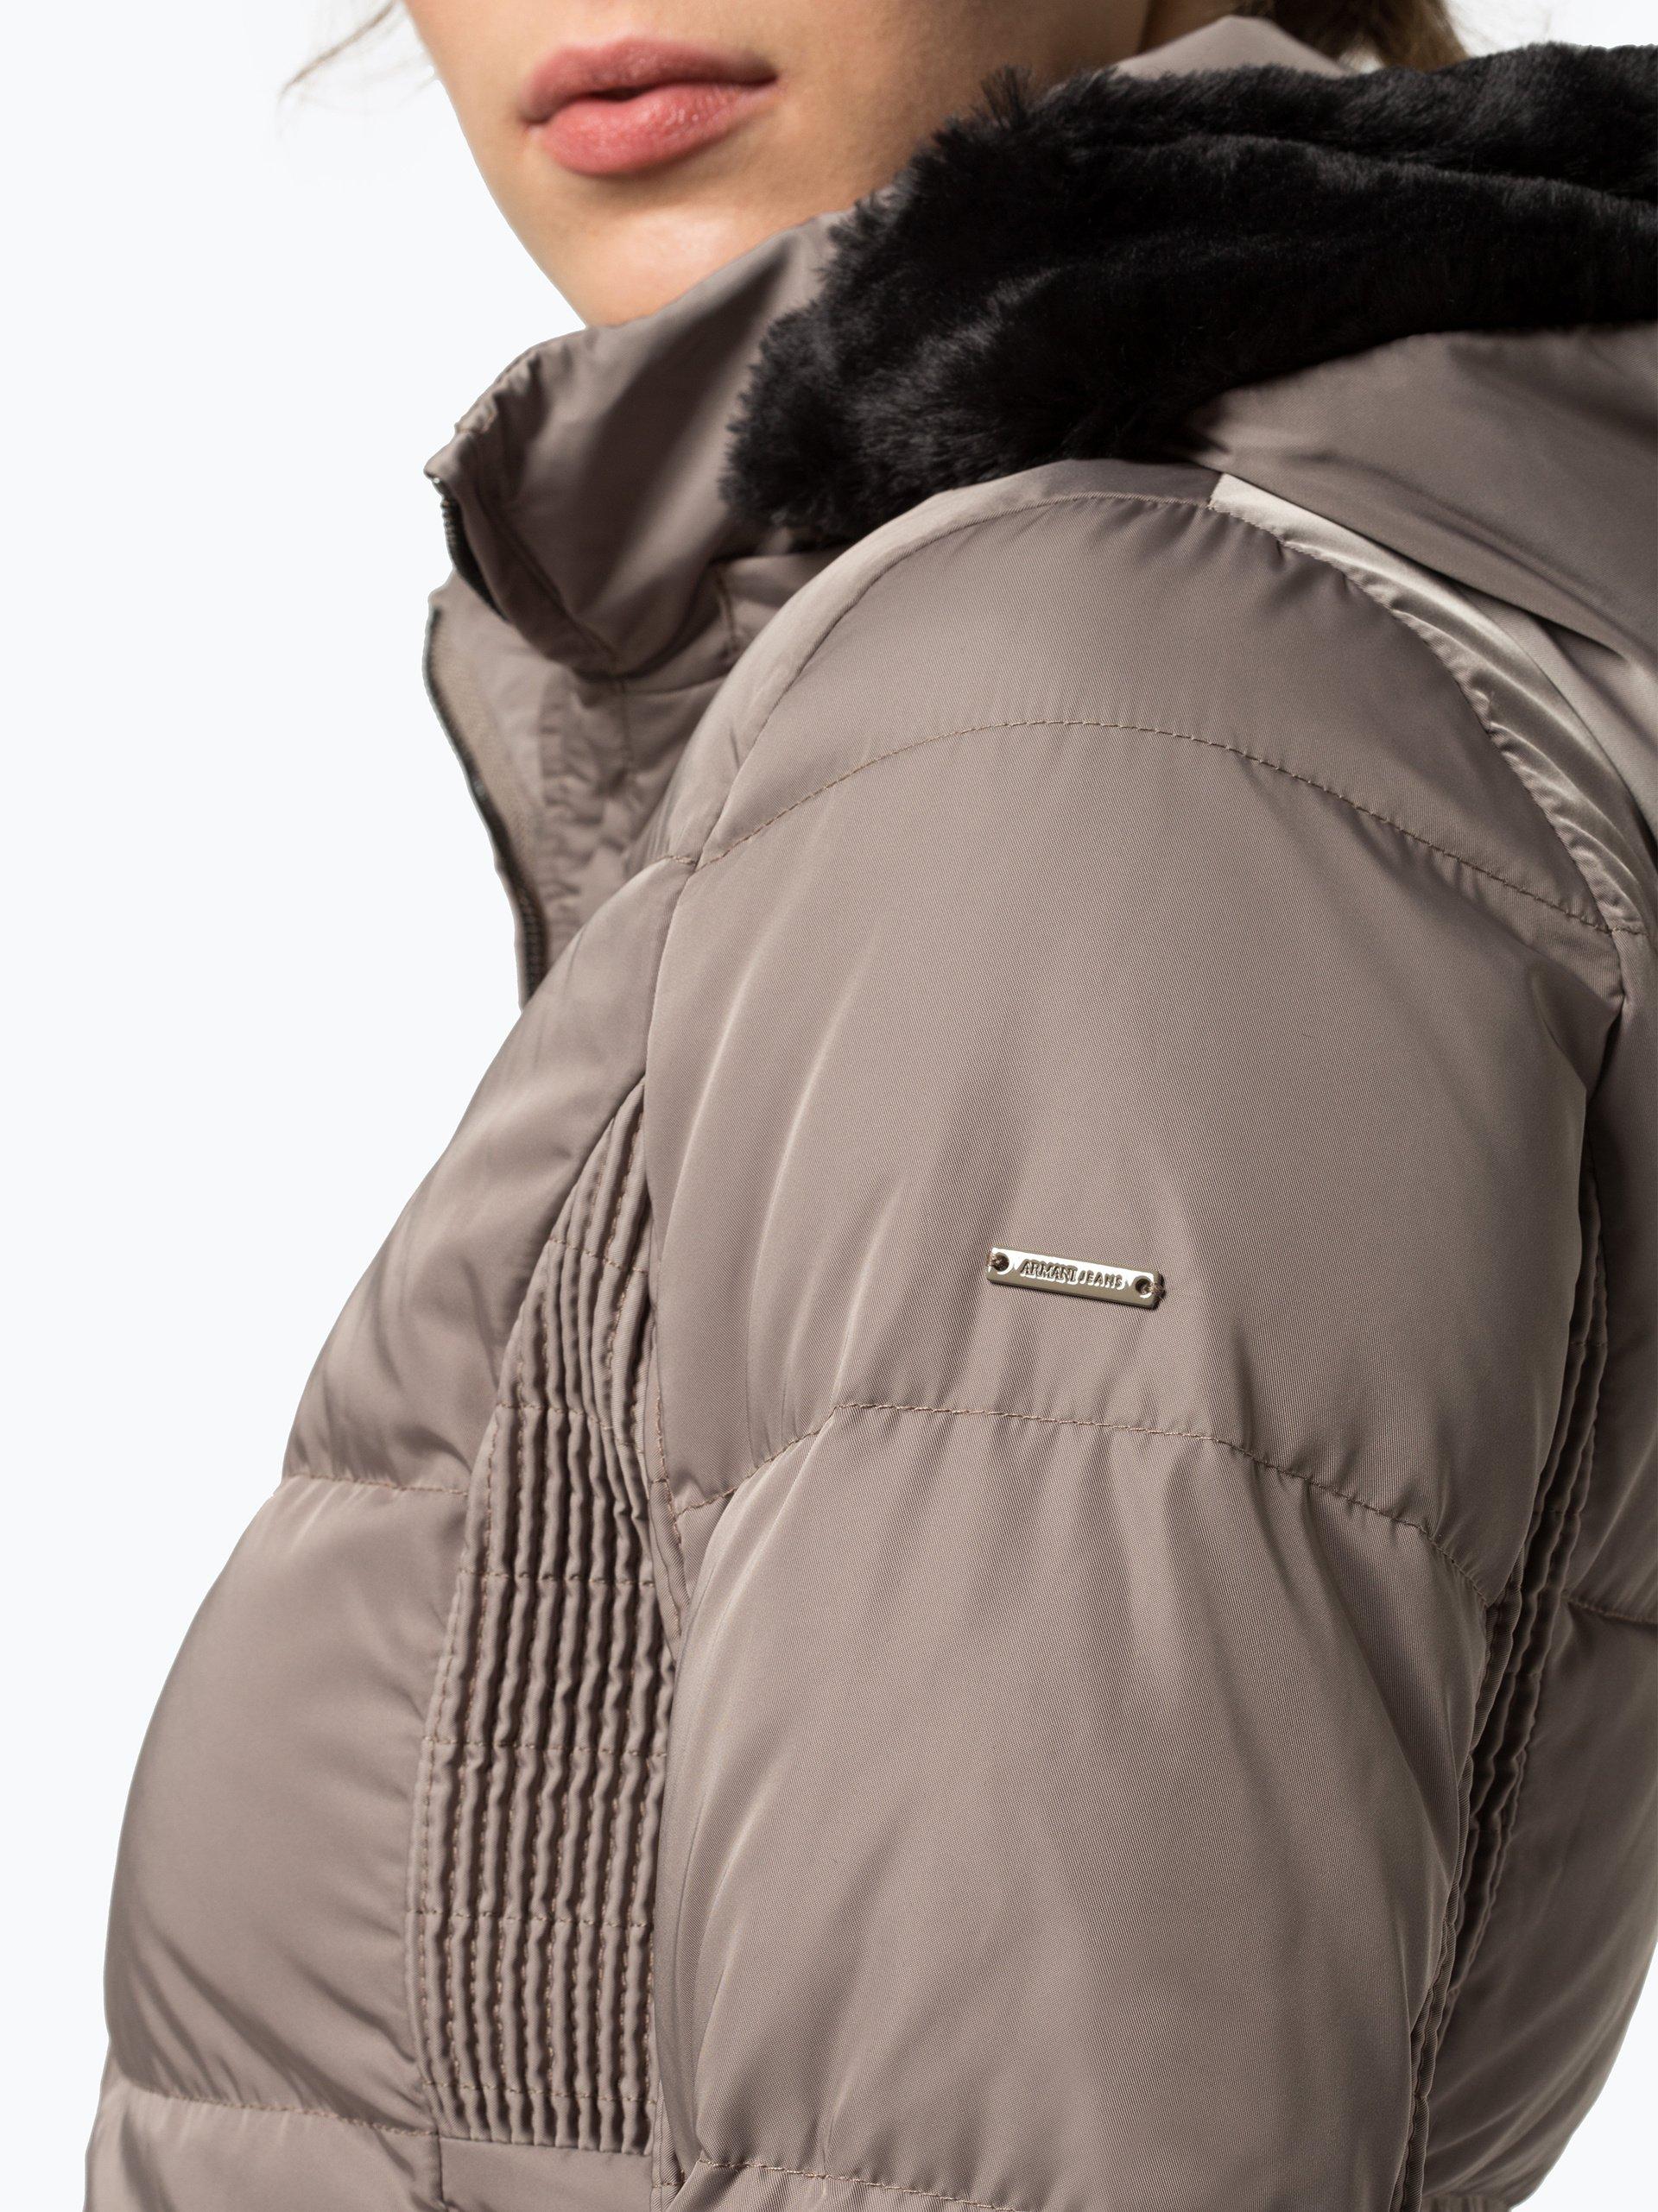 28bf56bbf03f Armani Jeans Damen Daunenmantel online kaufen   VANGRAAF.COM